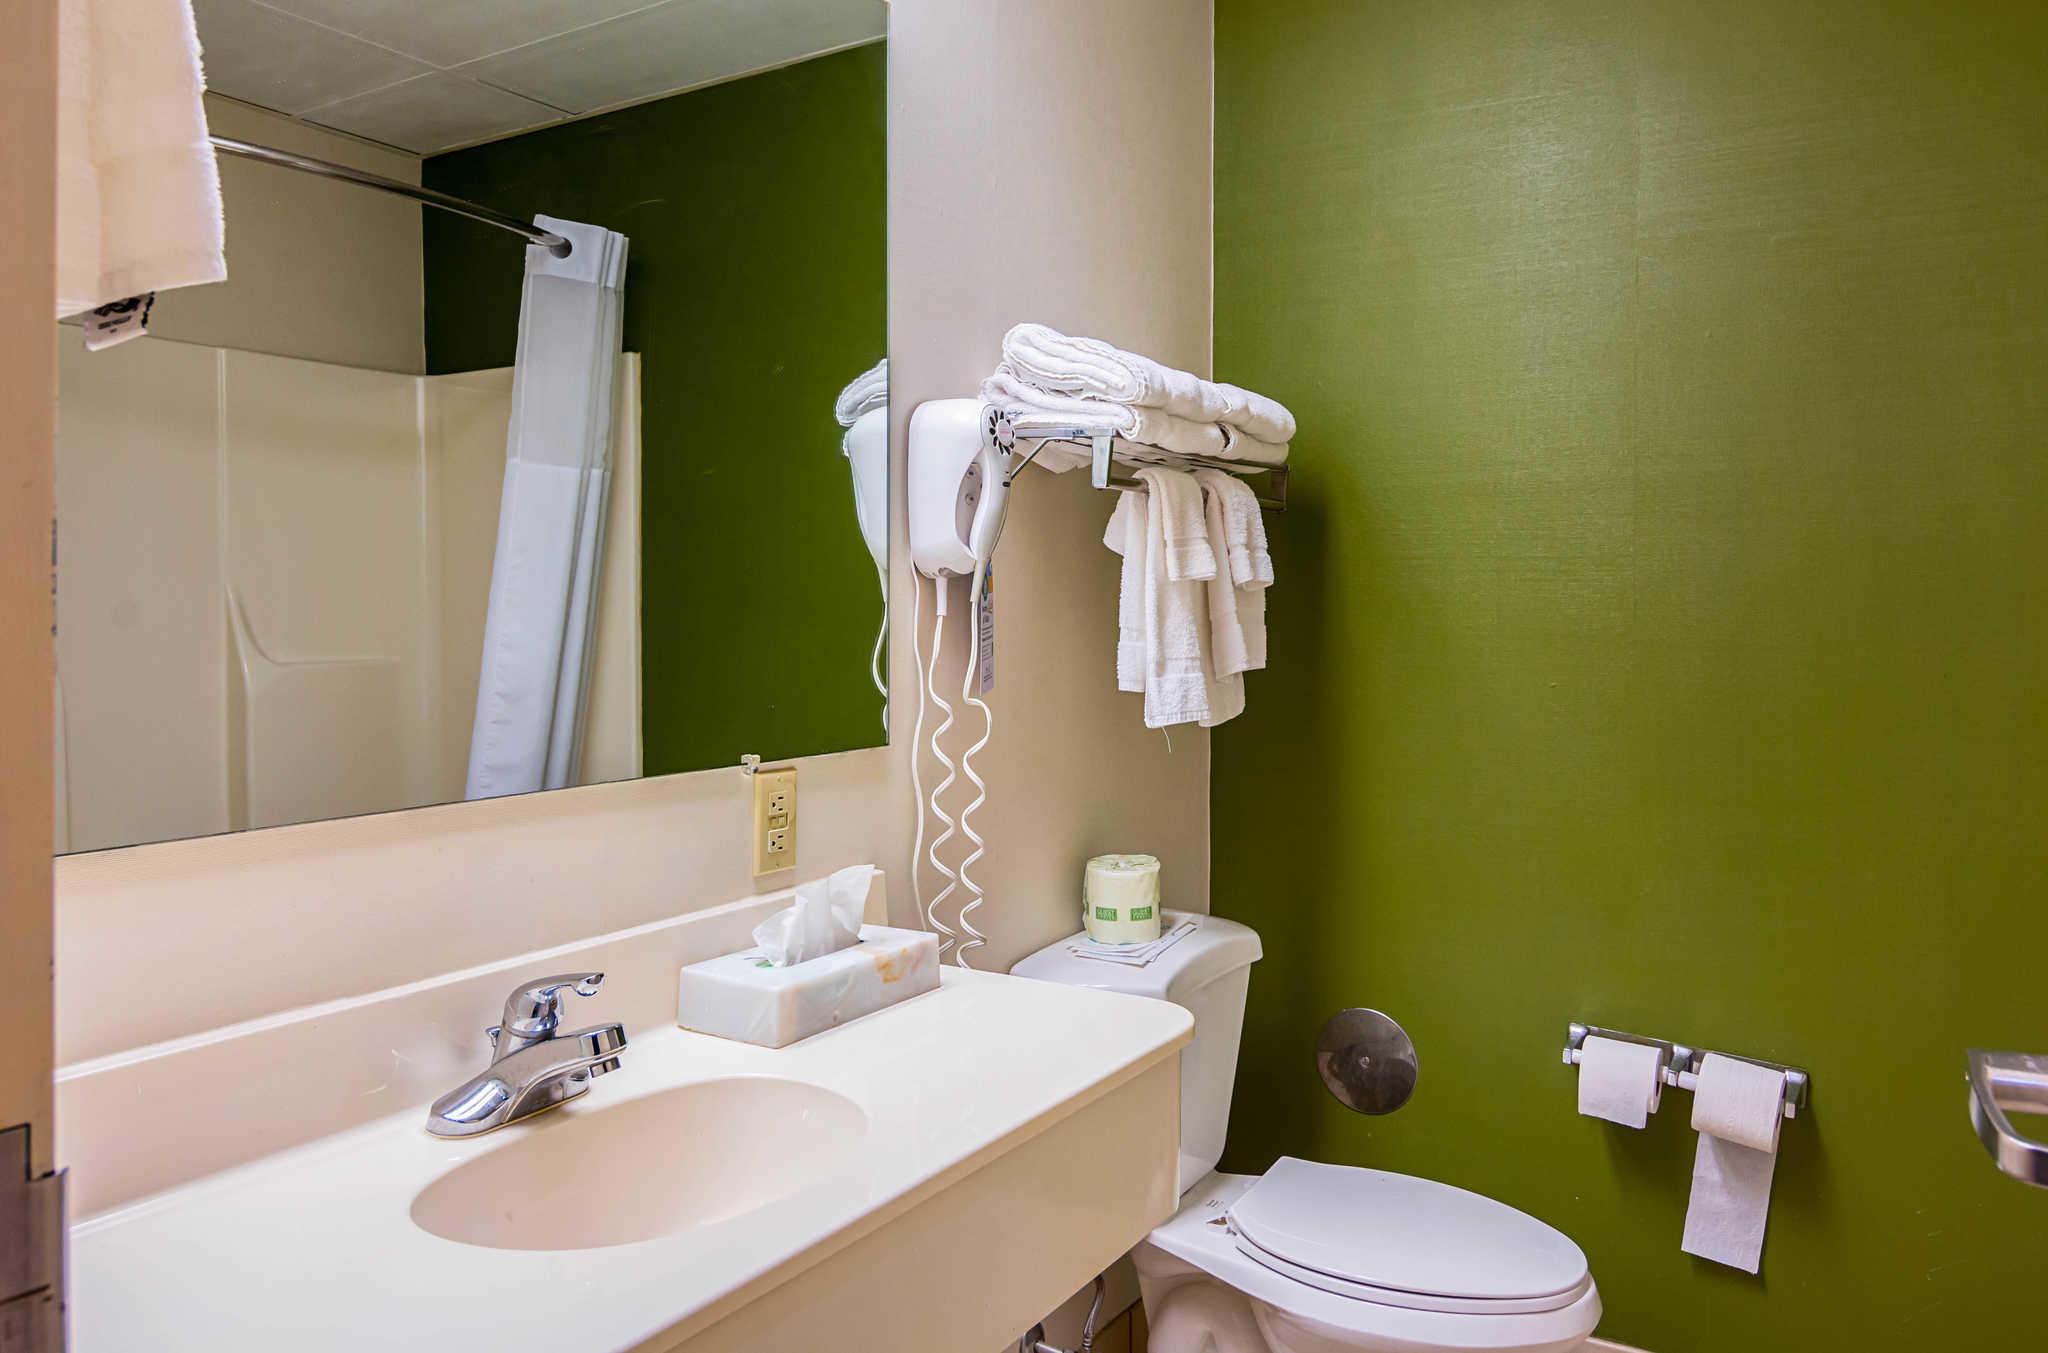 Quality Inn & Suites Kearneysville - Martinsburg image 10